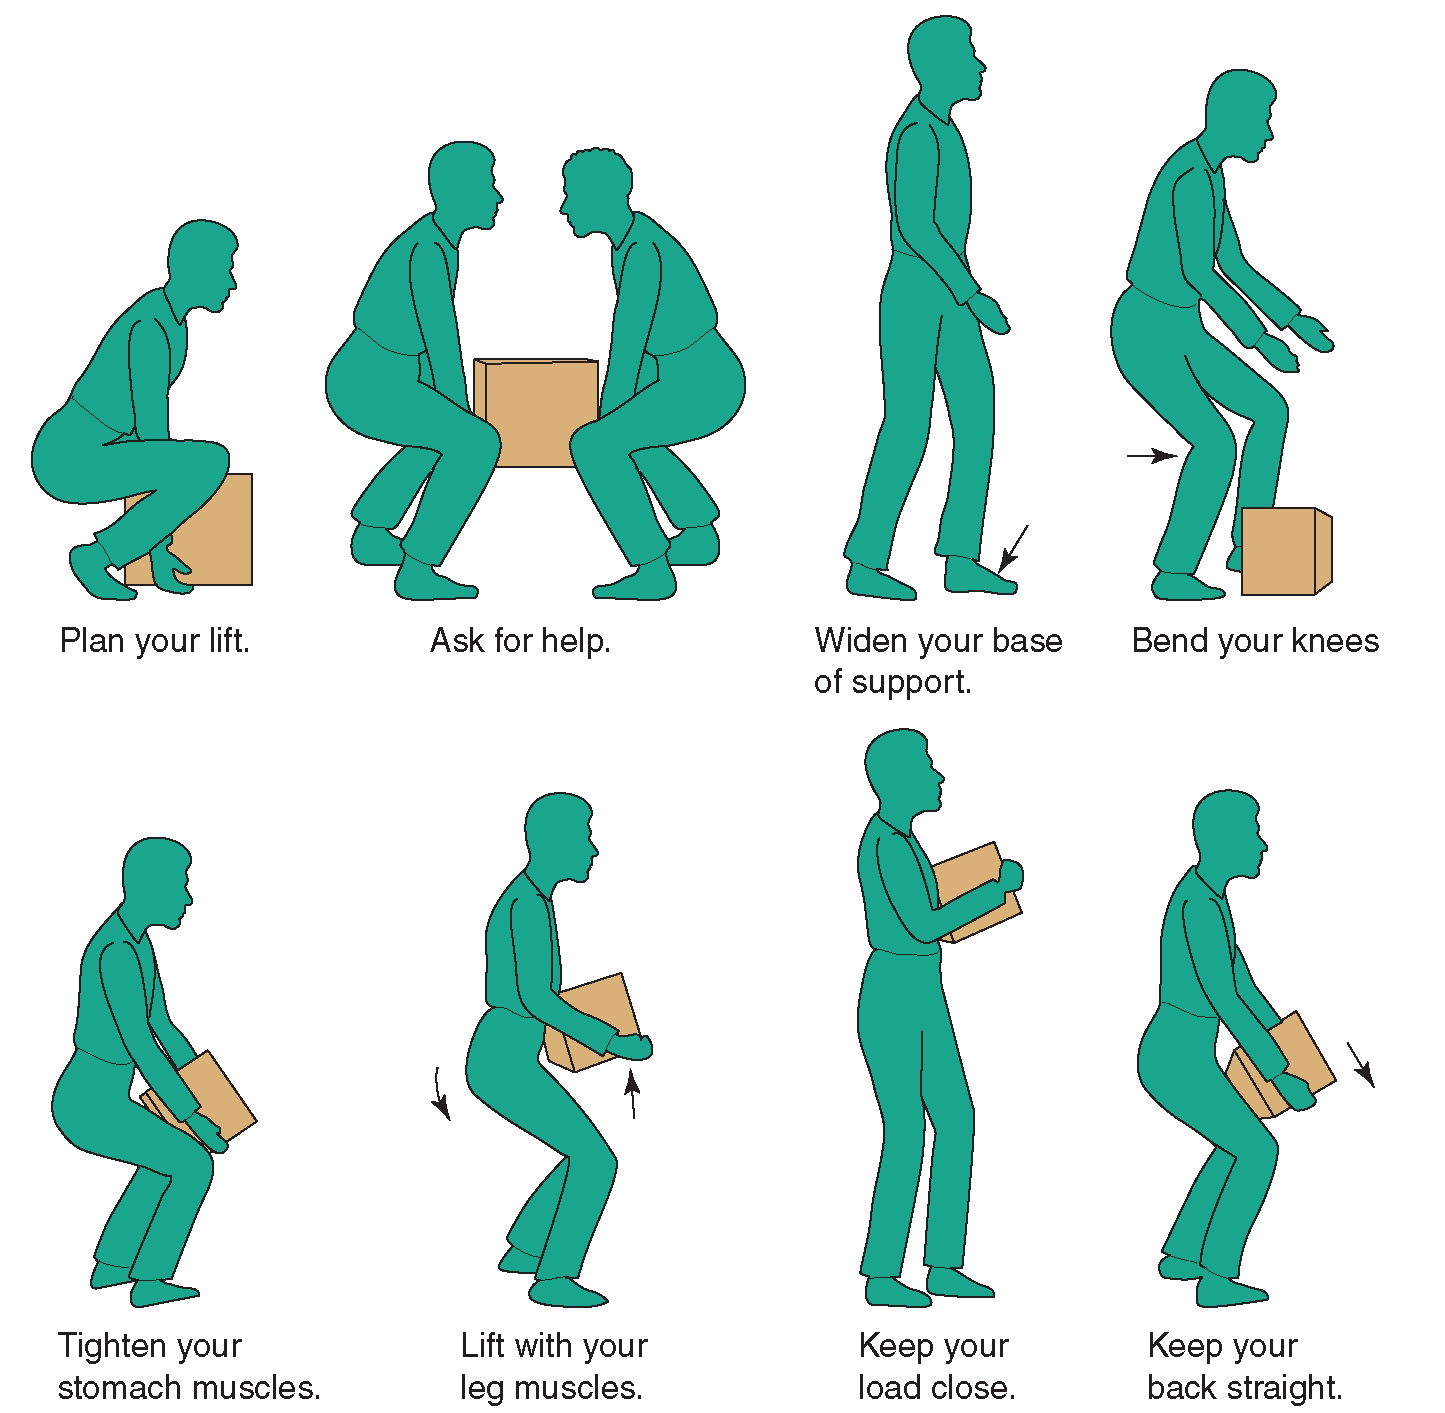 Body clipart body position. Mechanics incep imagine ex